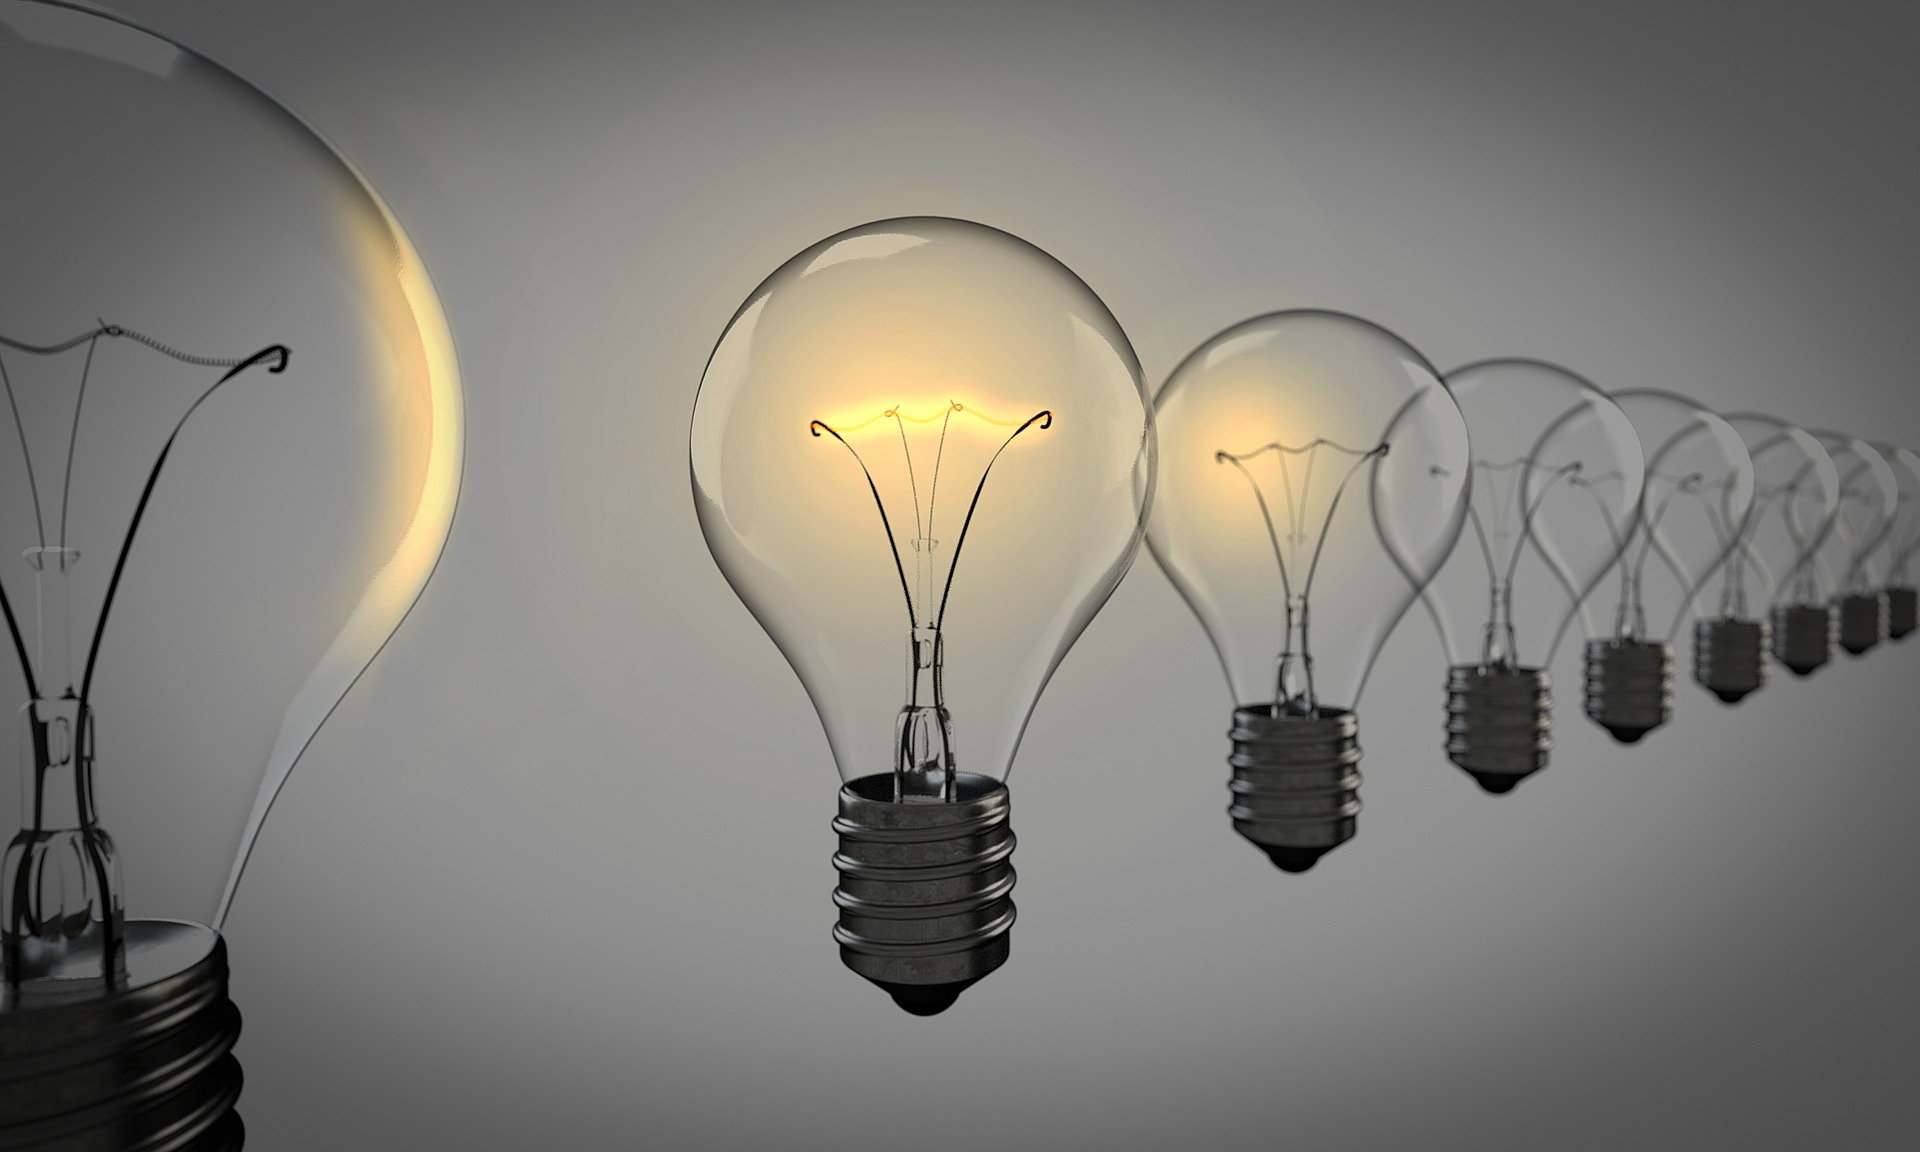 light-bulbs-1875384_1920.jpg